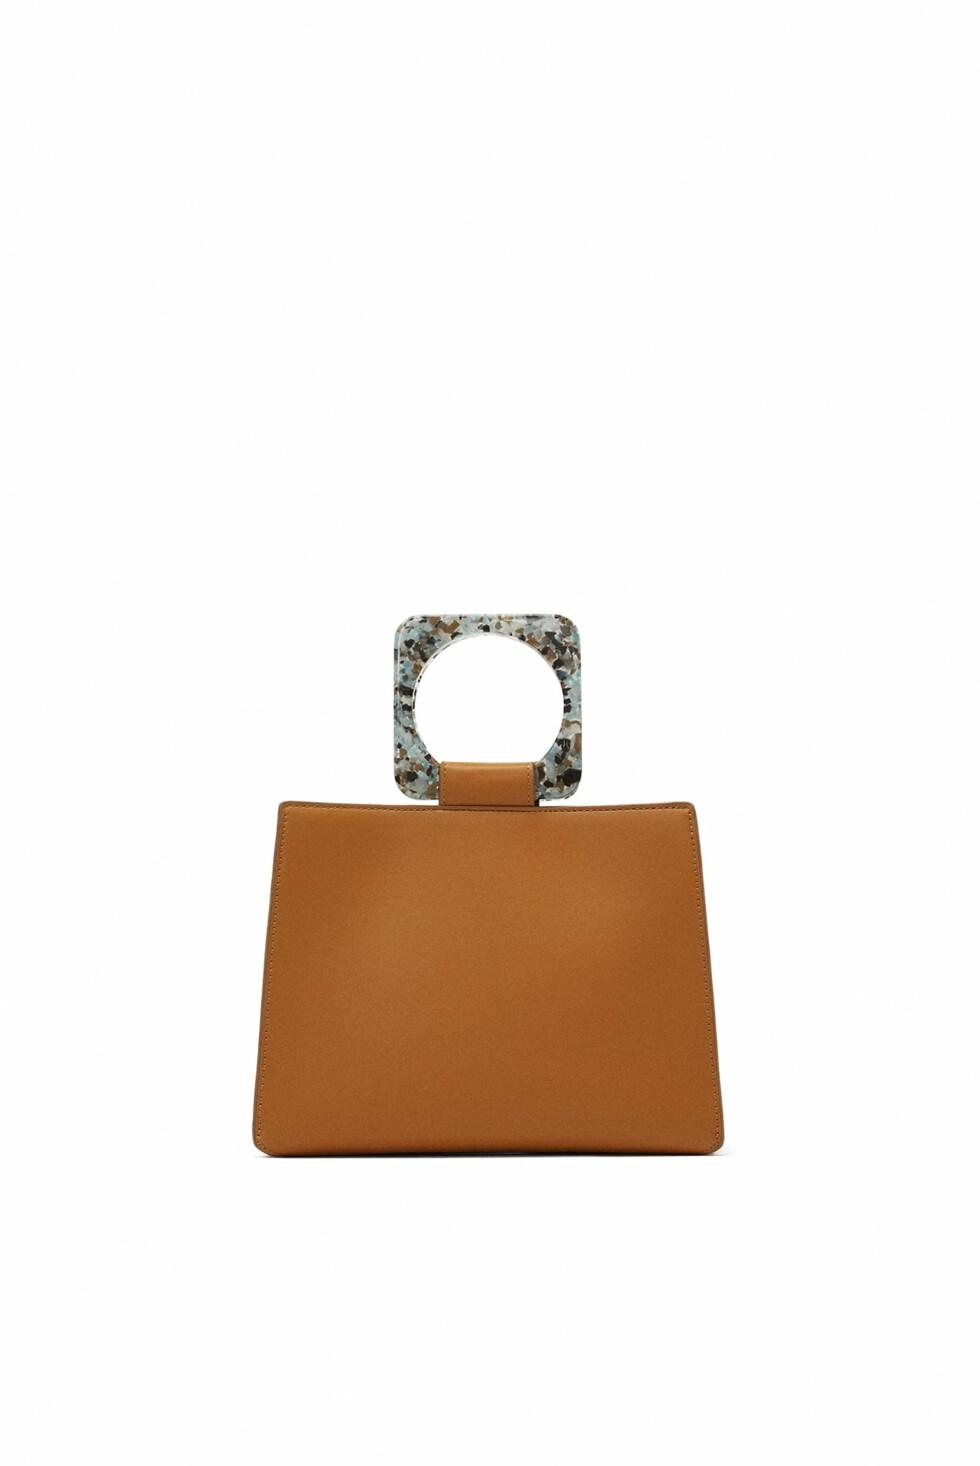 Zara,kr 350